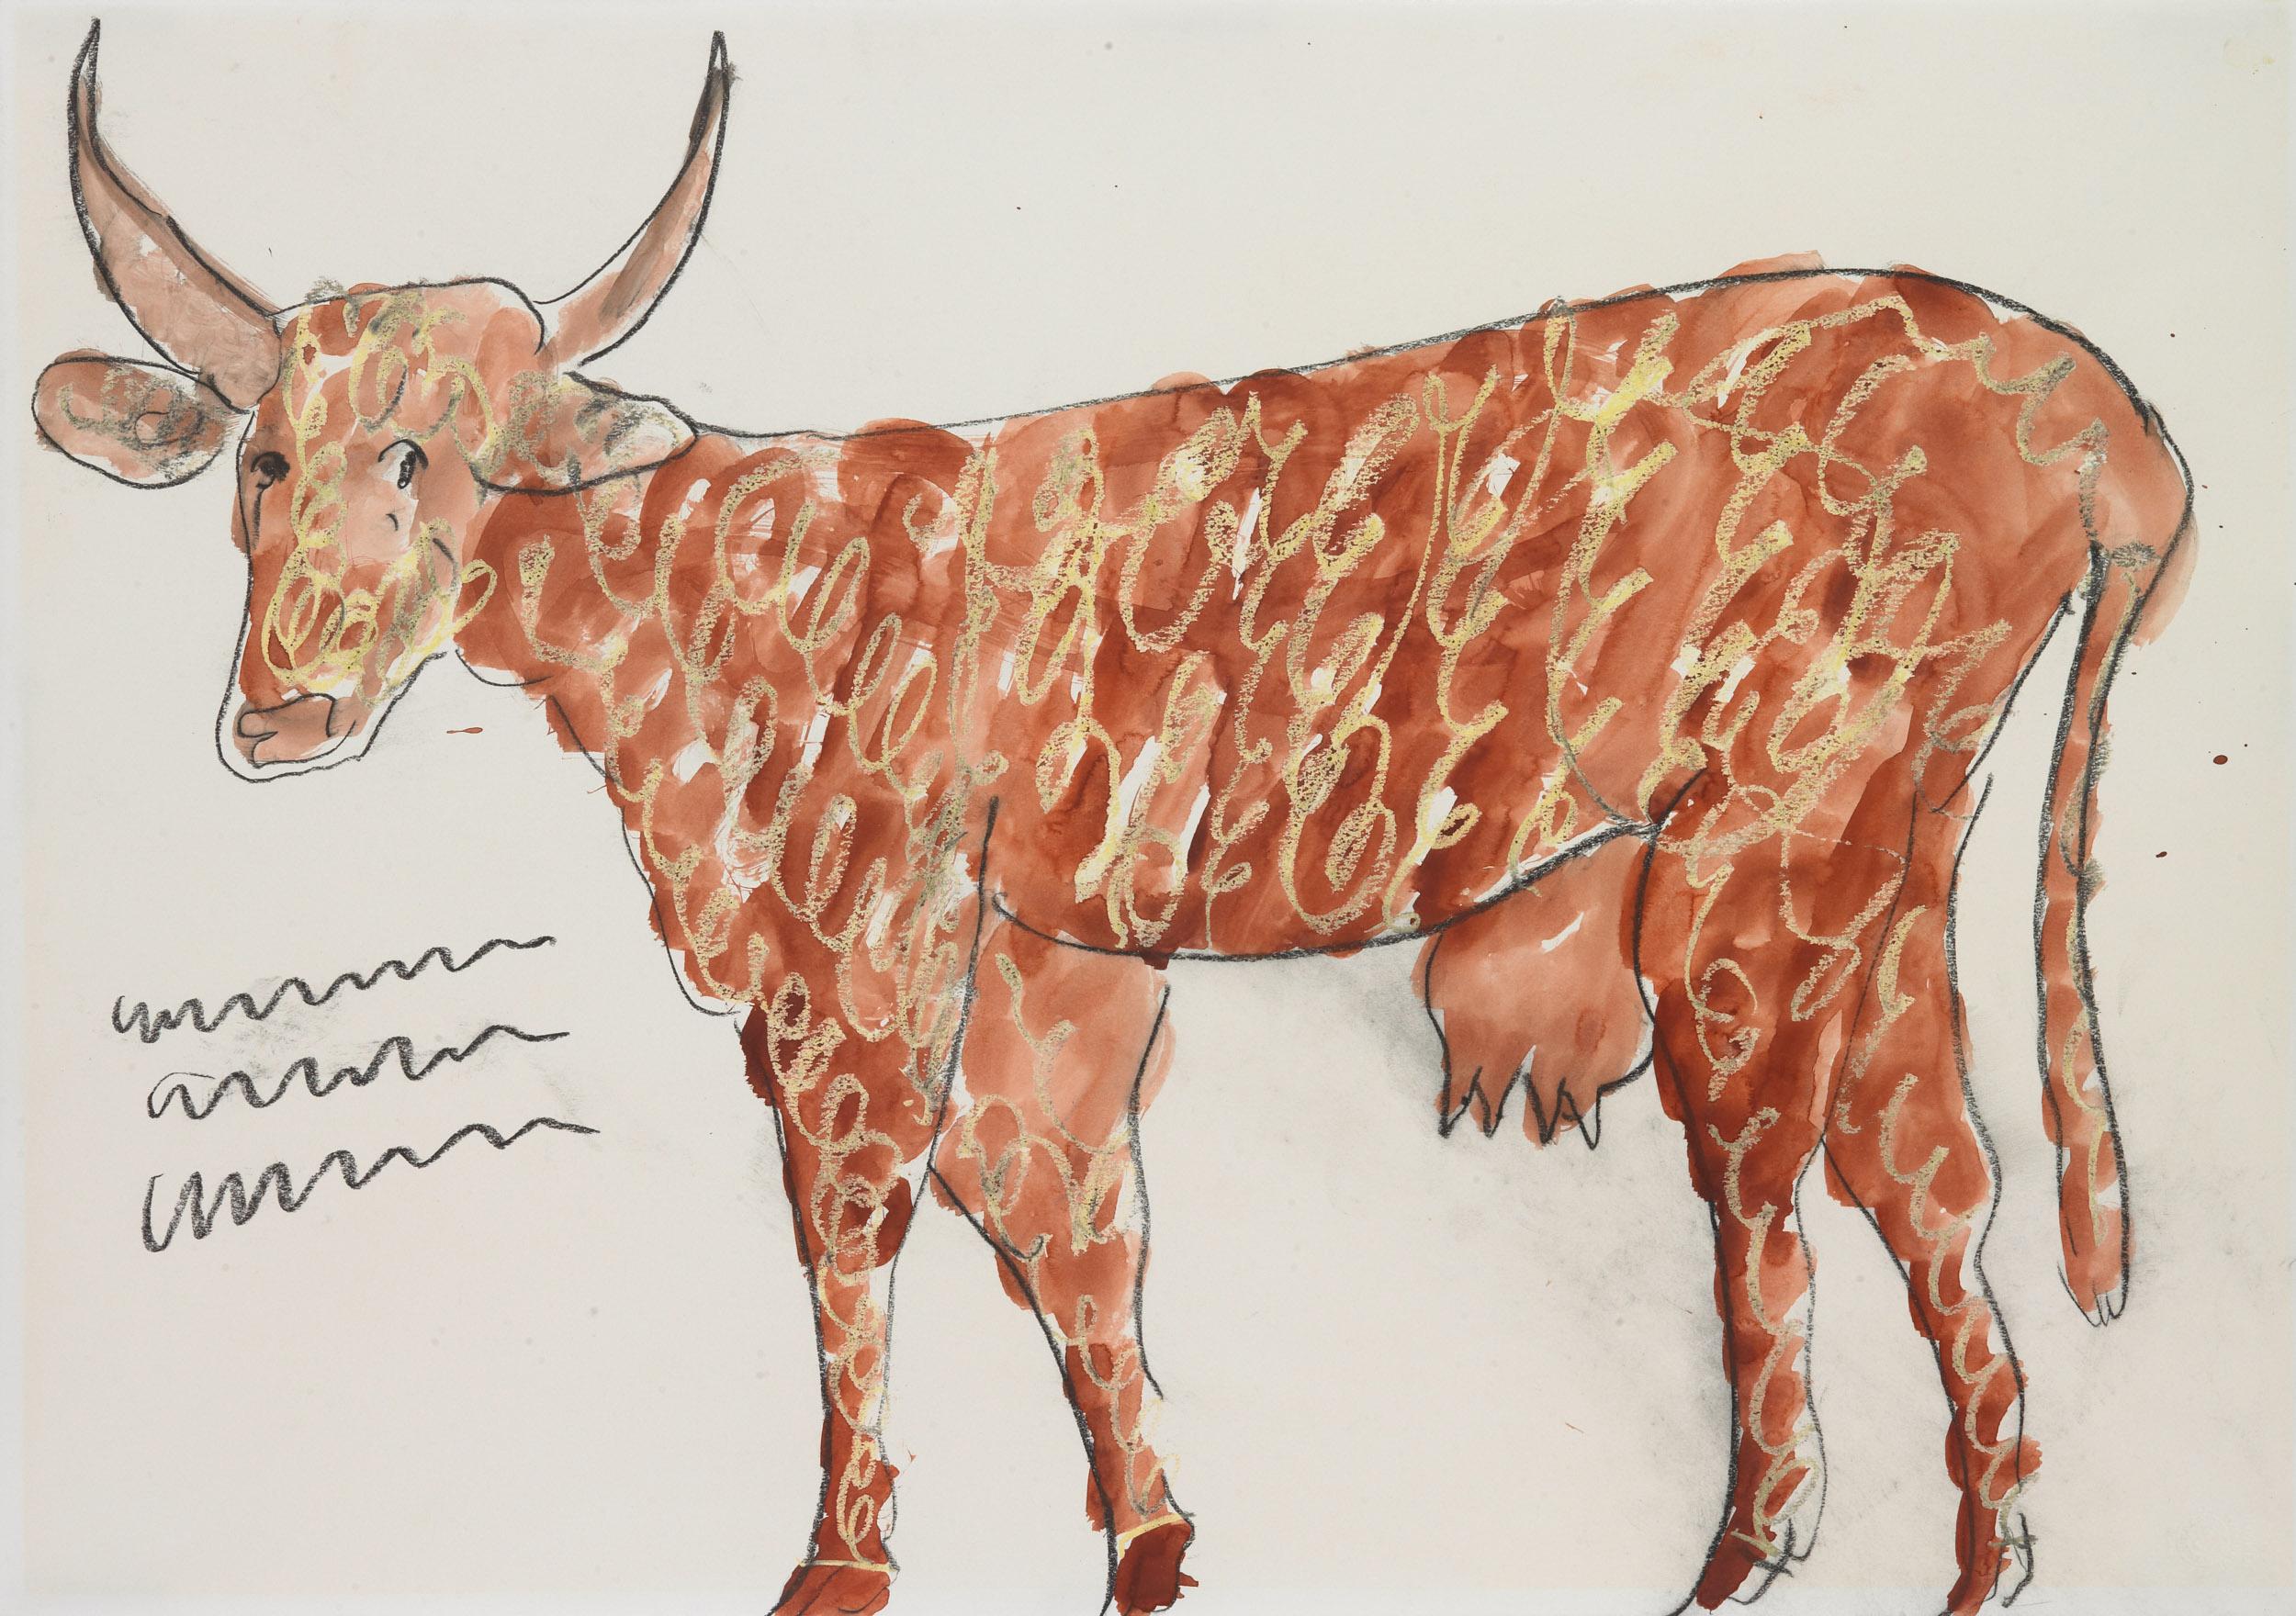 kamlander franz - Kuh / Cow